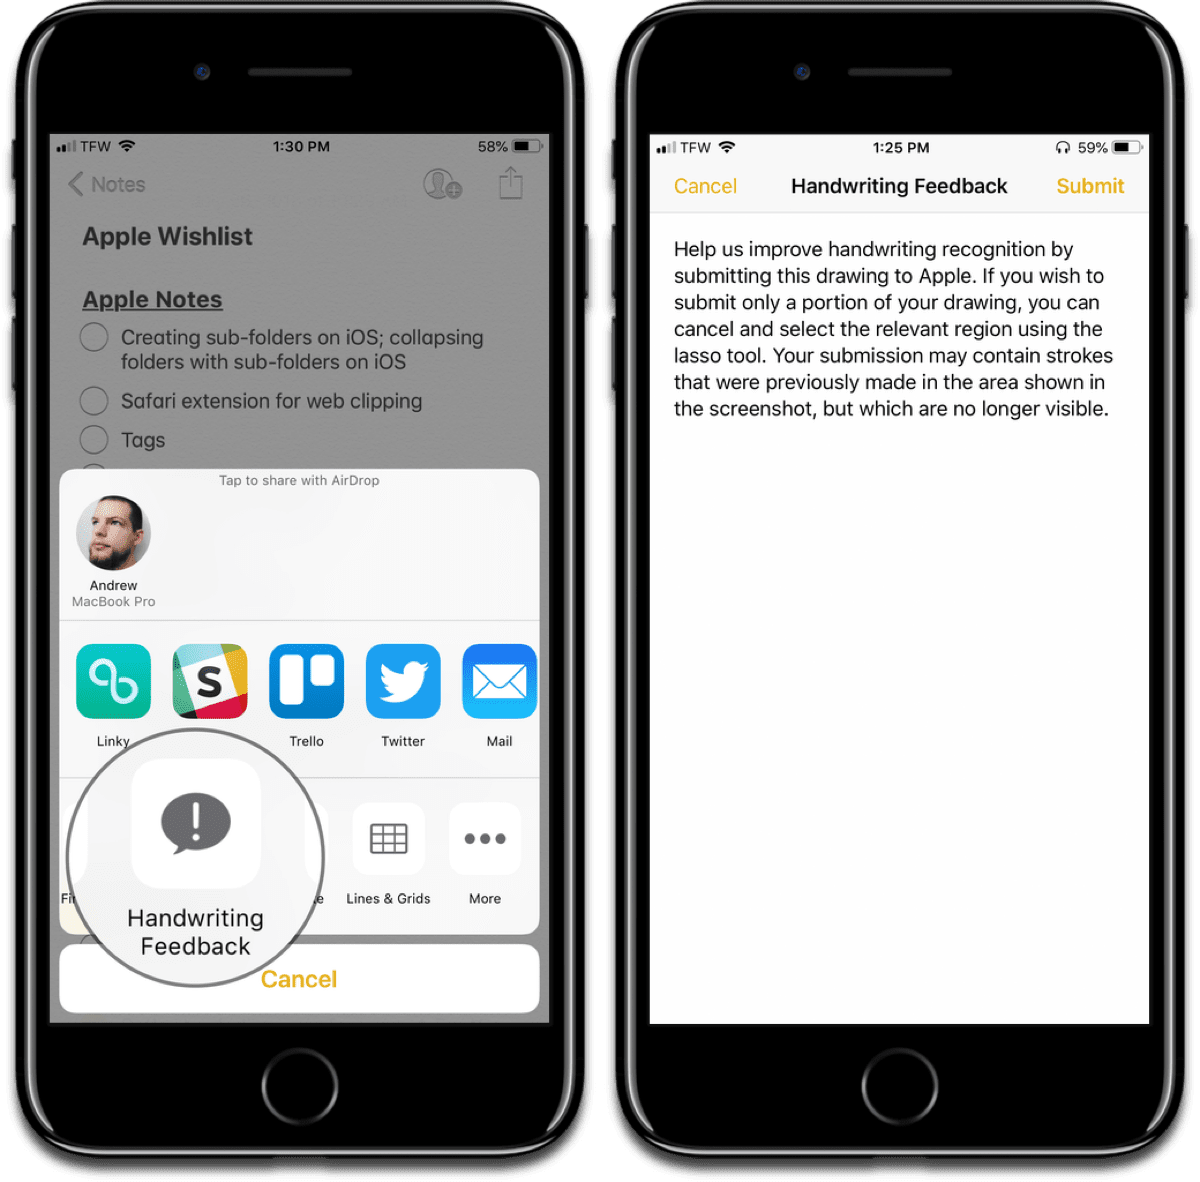 Screenshots of sending handwriting feedback in Apple Notes.